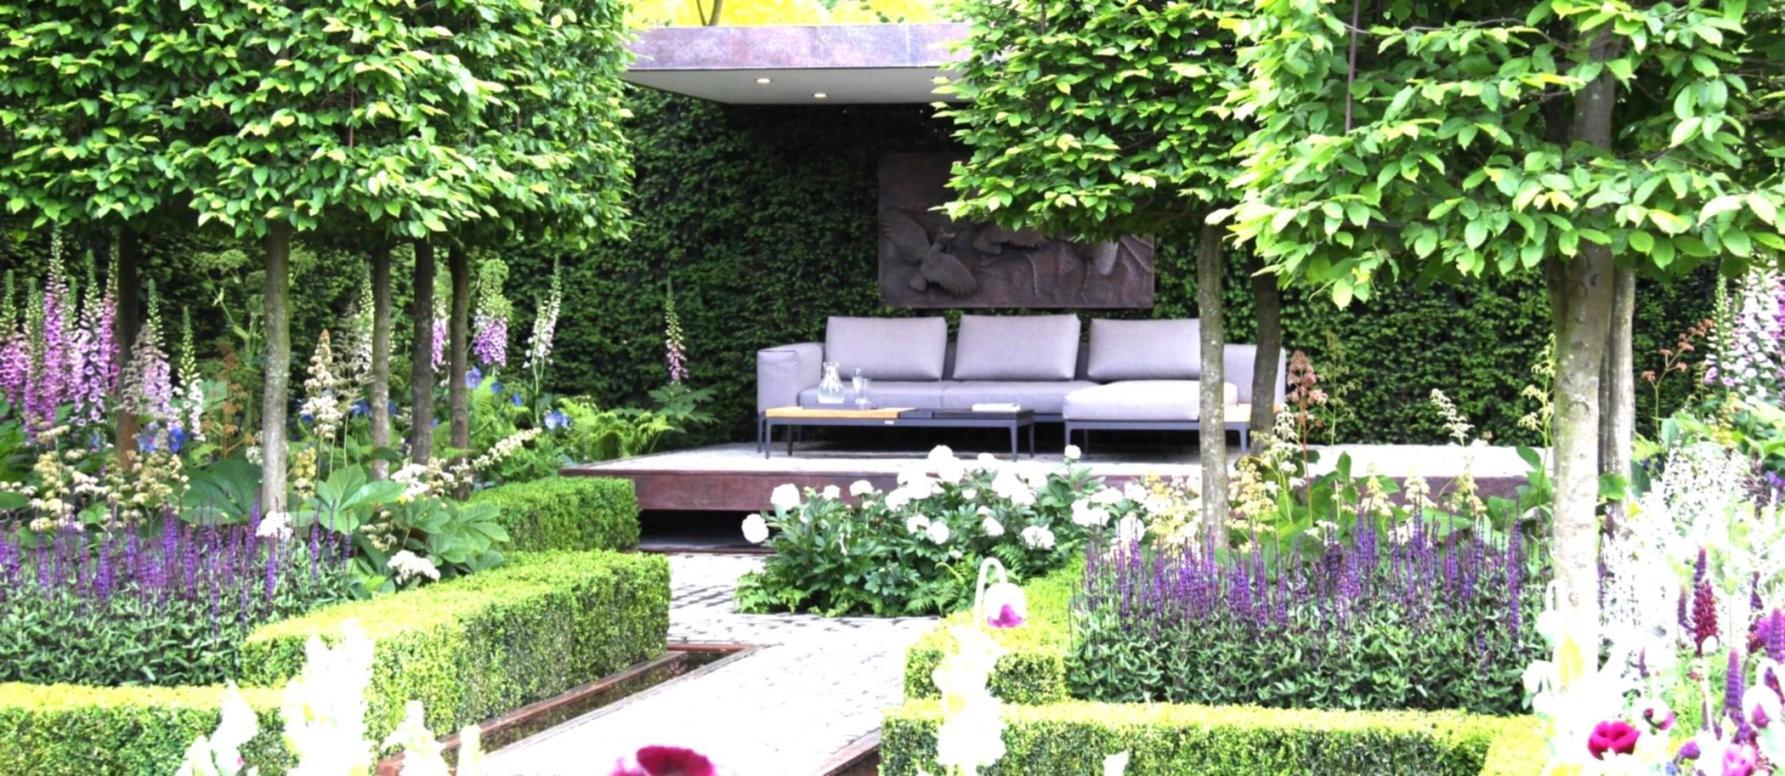 Pflanzen Japanischer Garten Luxe Japanischer Garten Ideen Luxus von Japanischer Garten Gestaltungsideen Photo